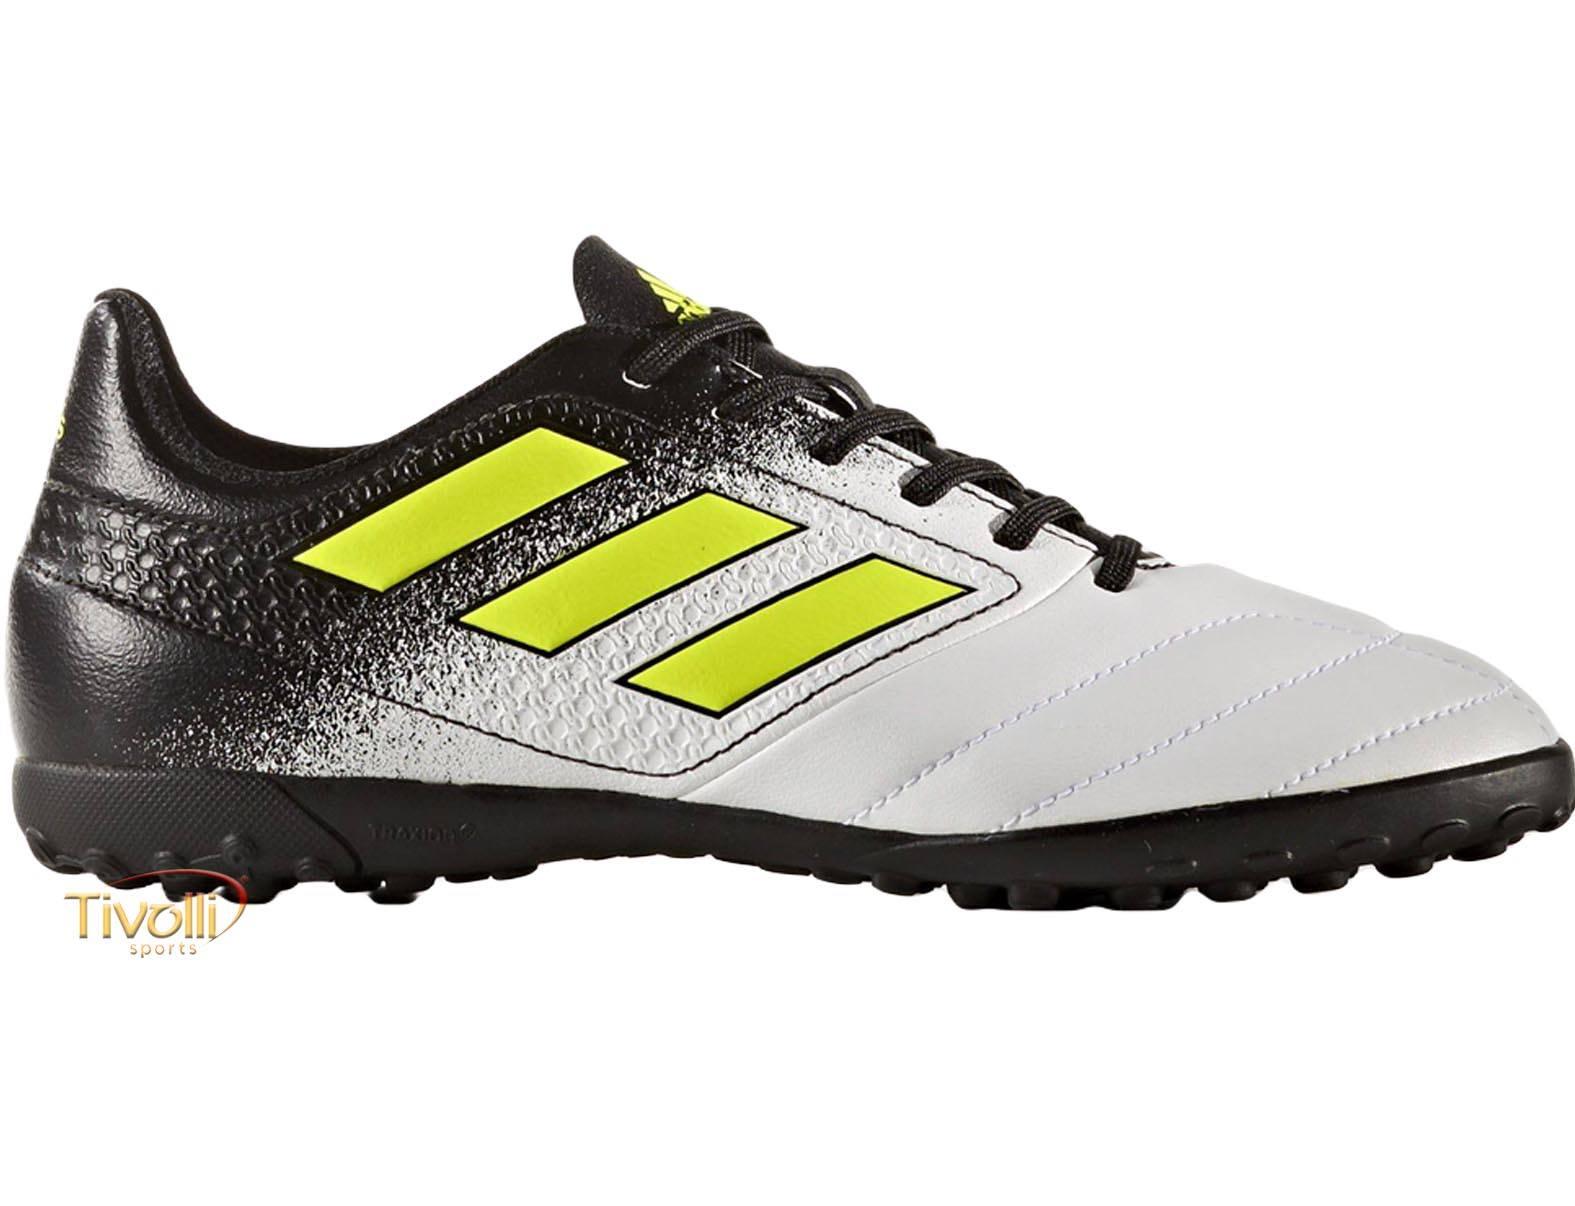 ... Chuteira Adidas Ace 17.4 J Infantil TF Society d67379e2eb944c ... 255bfc5652e83